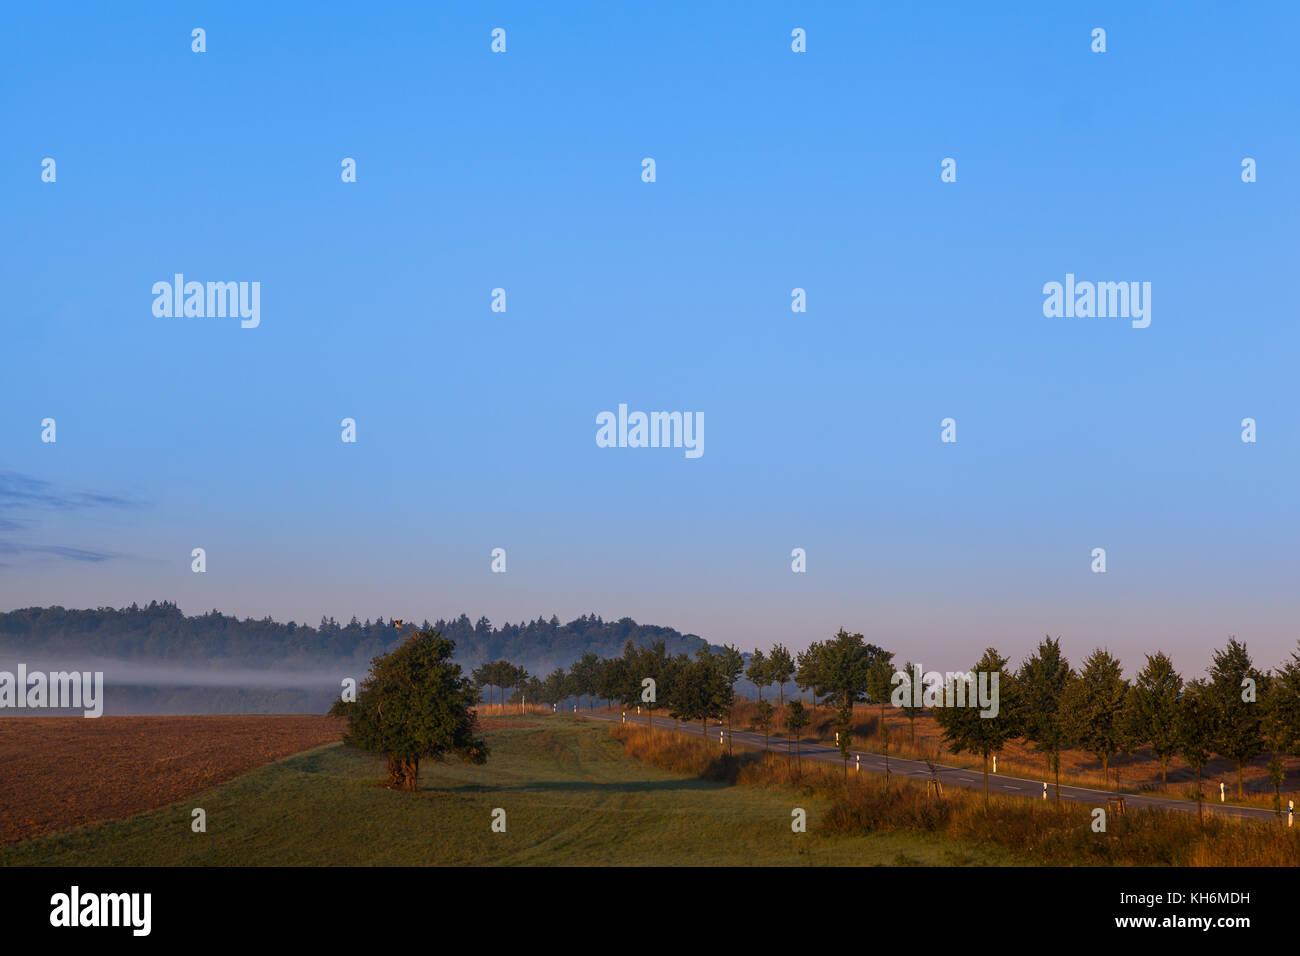 Sonnenaufgang Landschaftsaufnahme - Stock Image